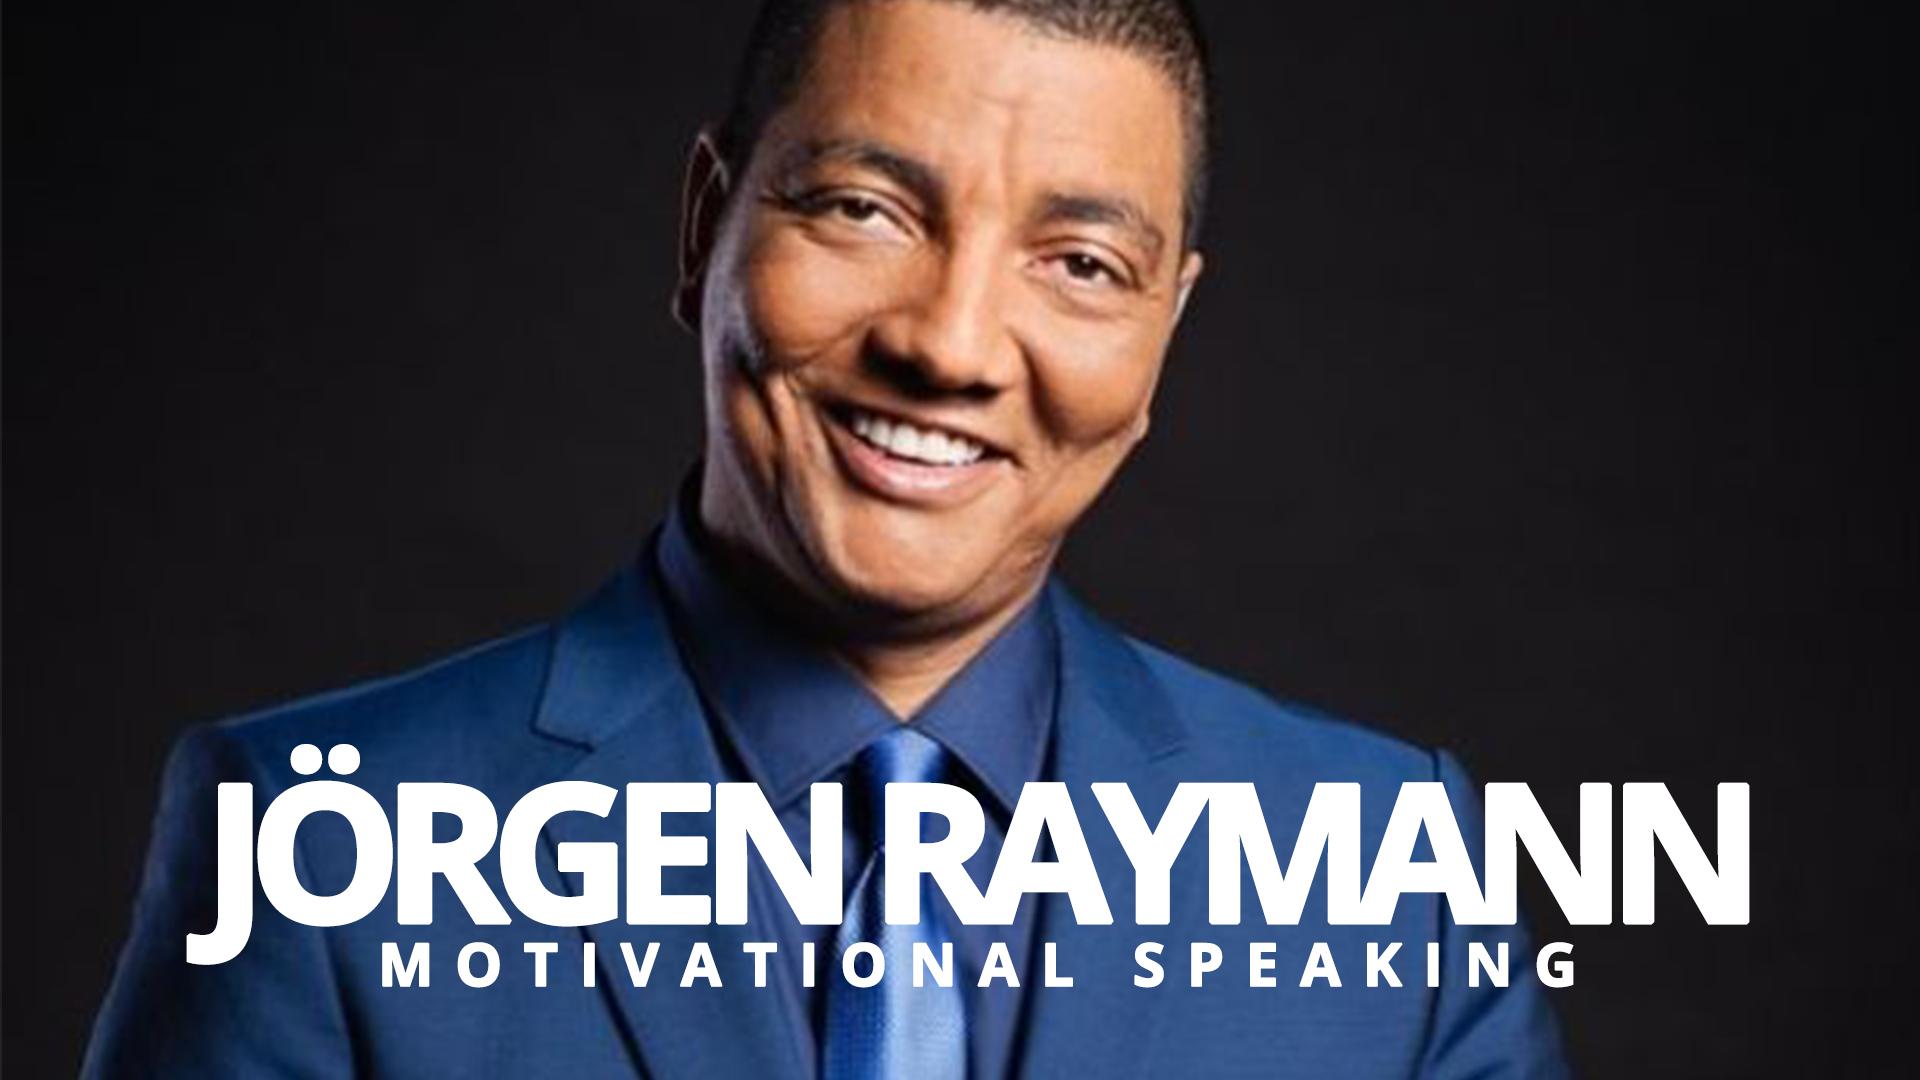 Jorgen Raymann – Speaker Video